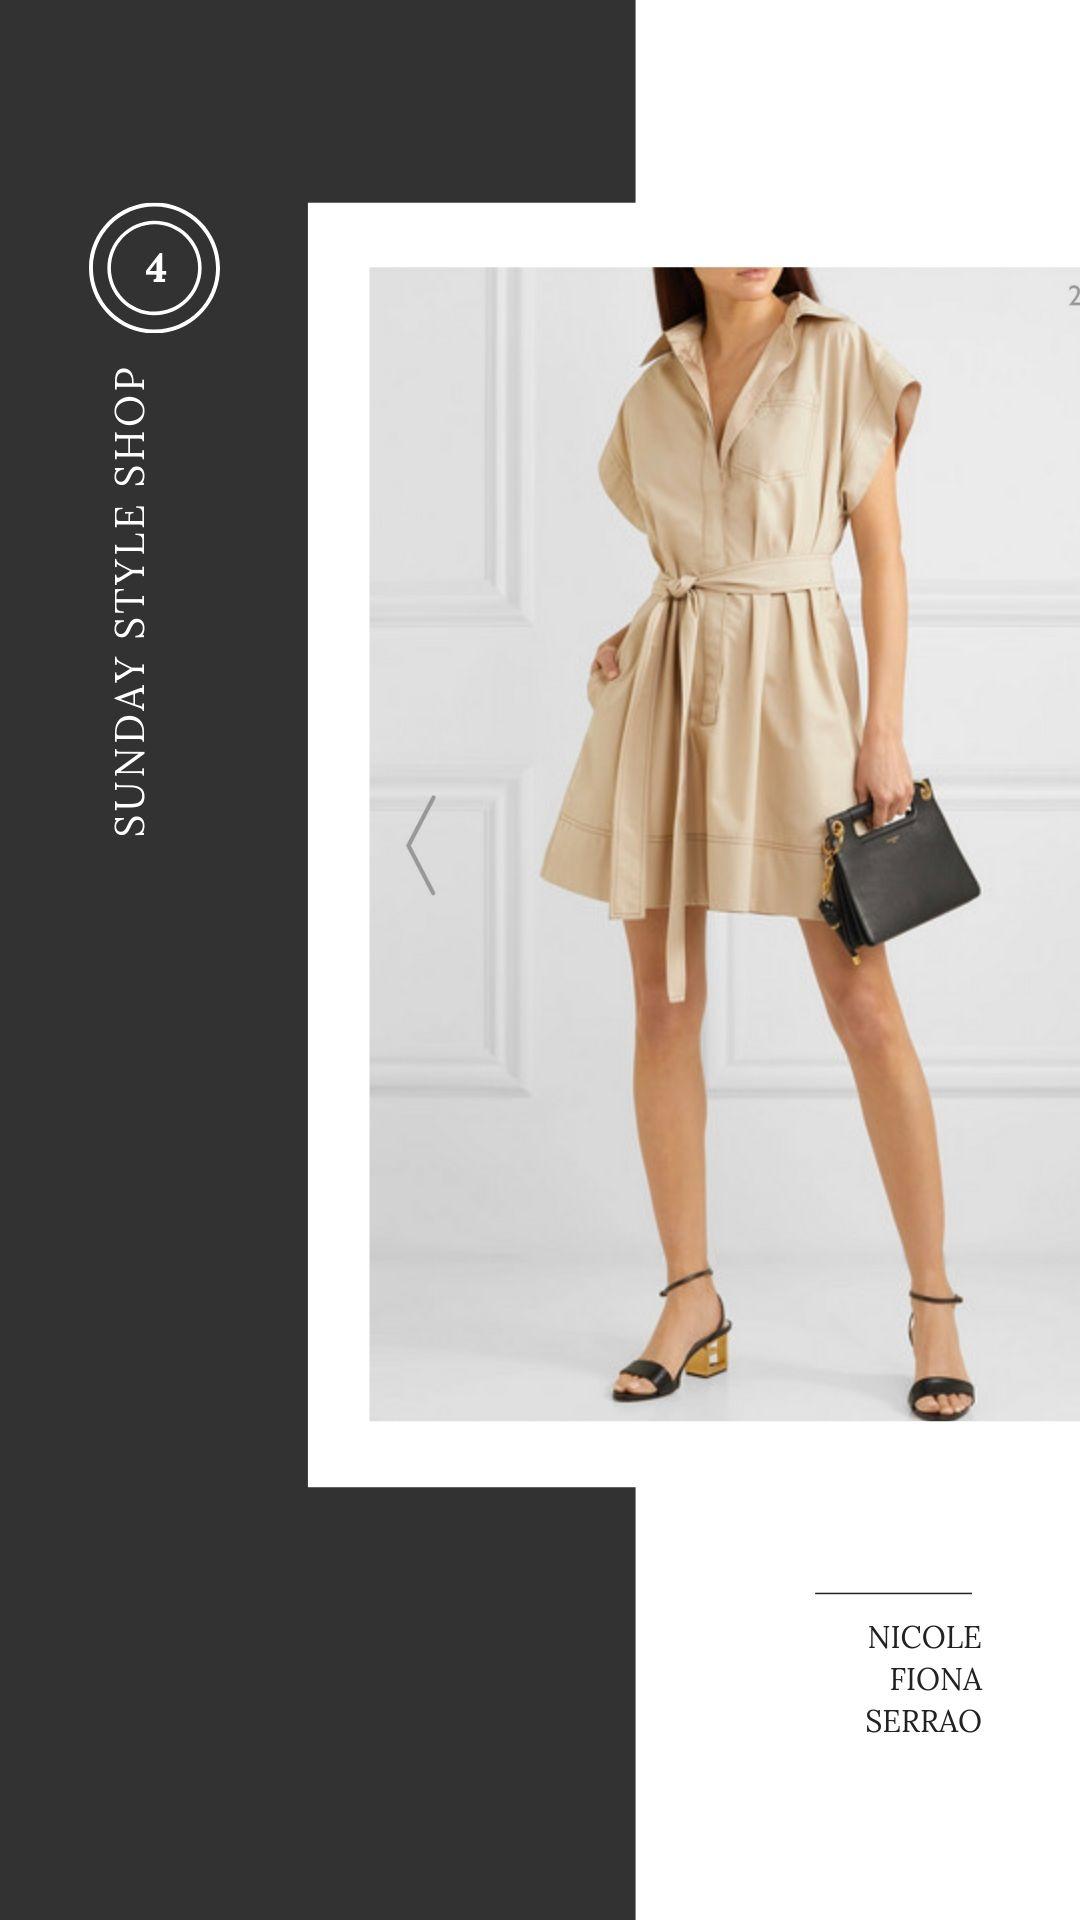 Nicole Fiona Serrao Sunday Style Shop Givenchy Khaki Dress